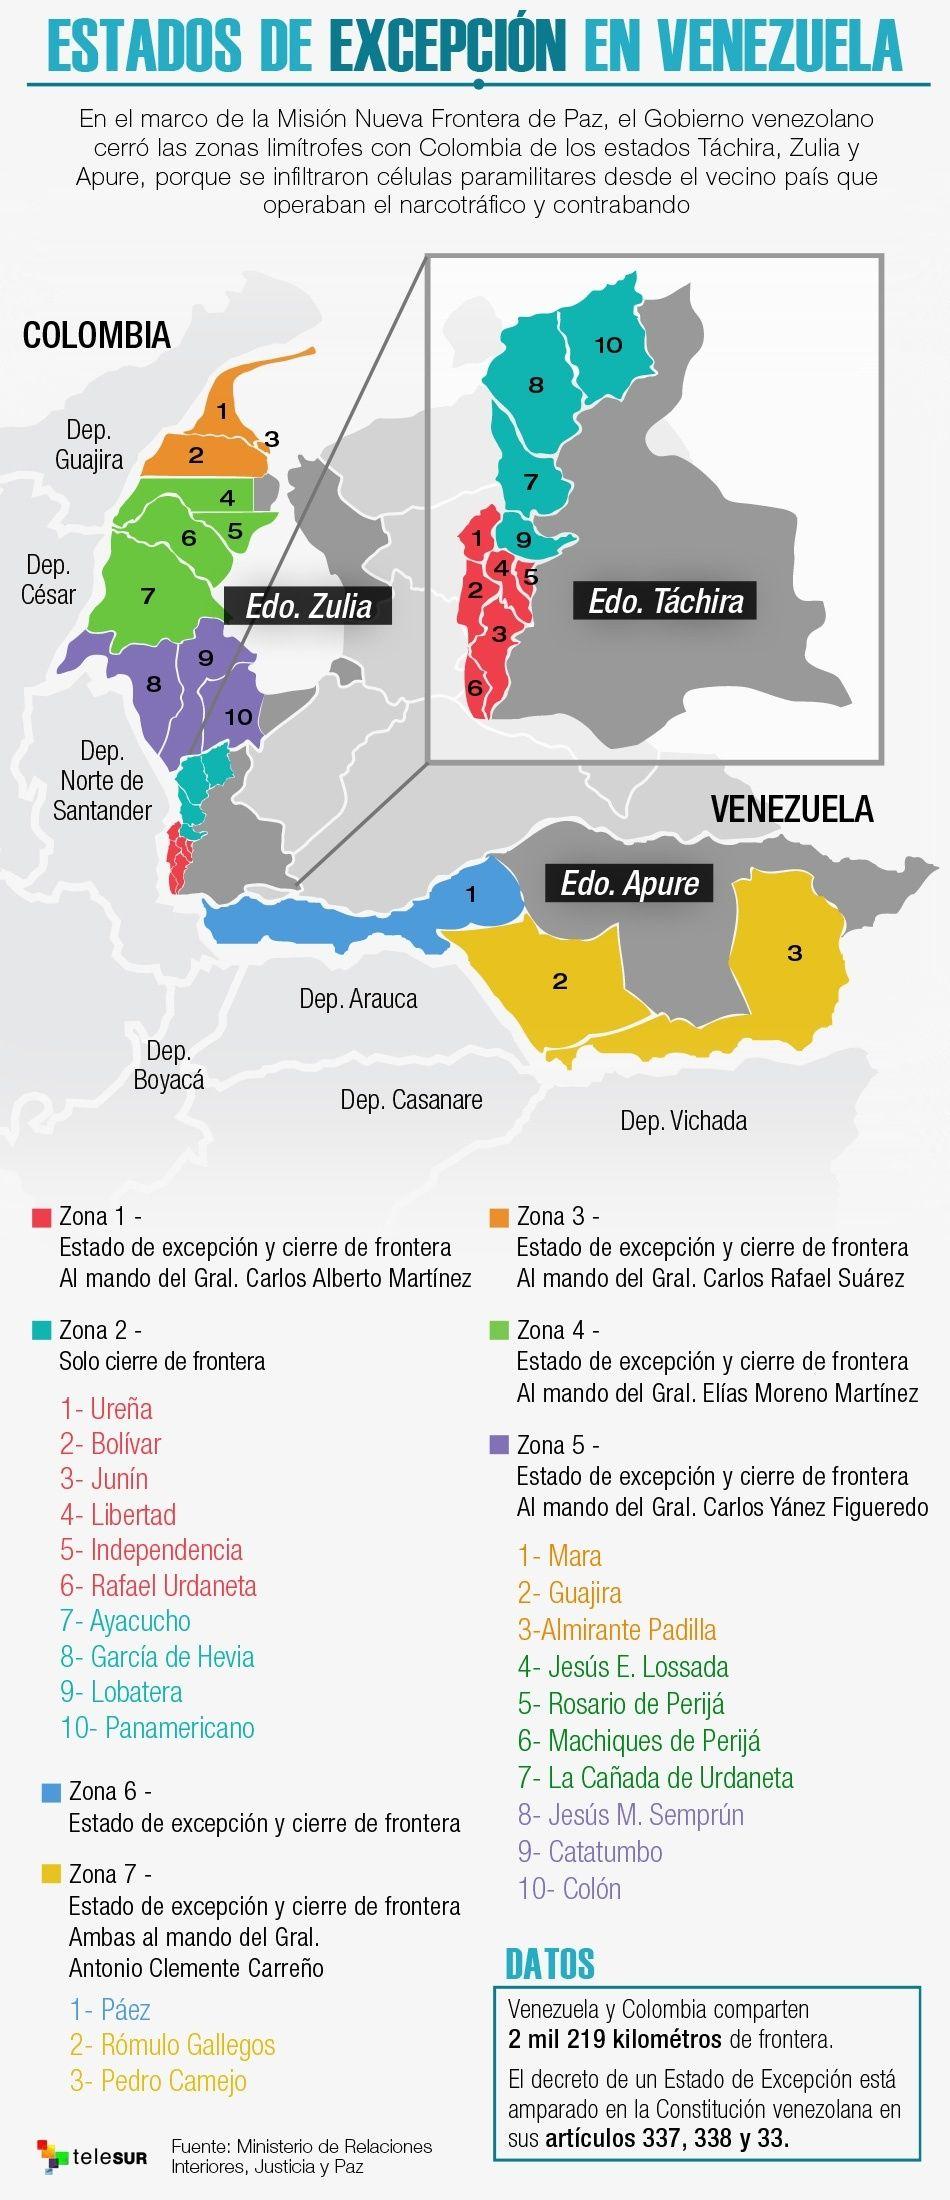 Posible violencia paramilitar en frontera colombo-venezolana